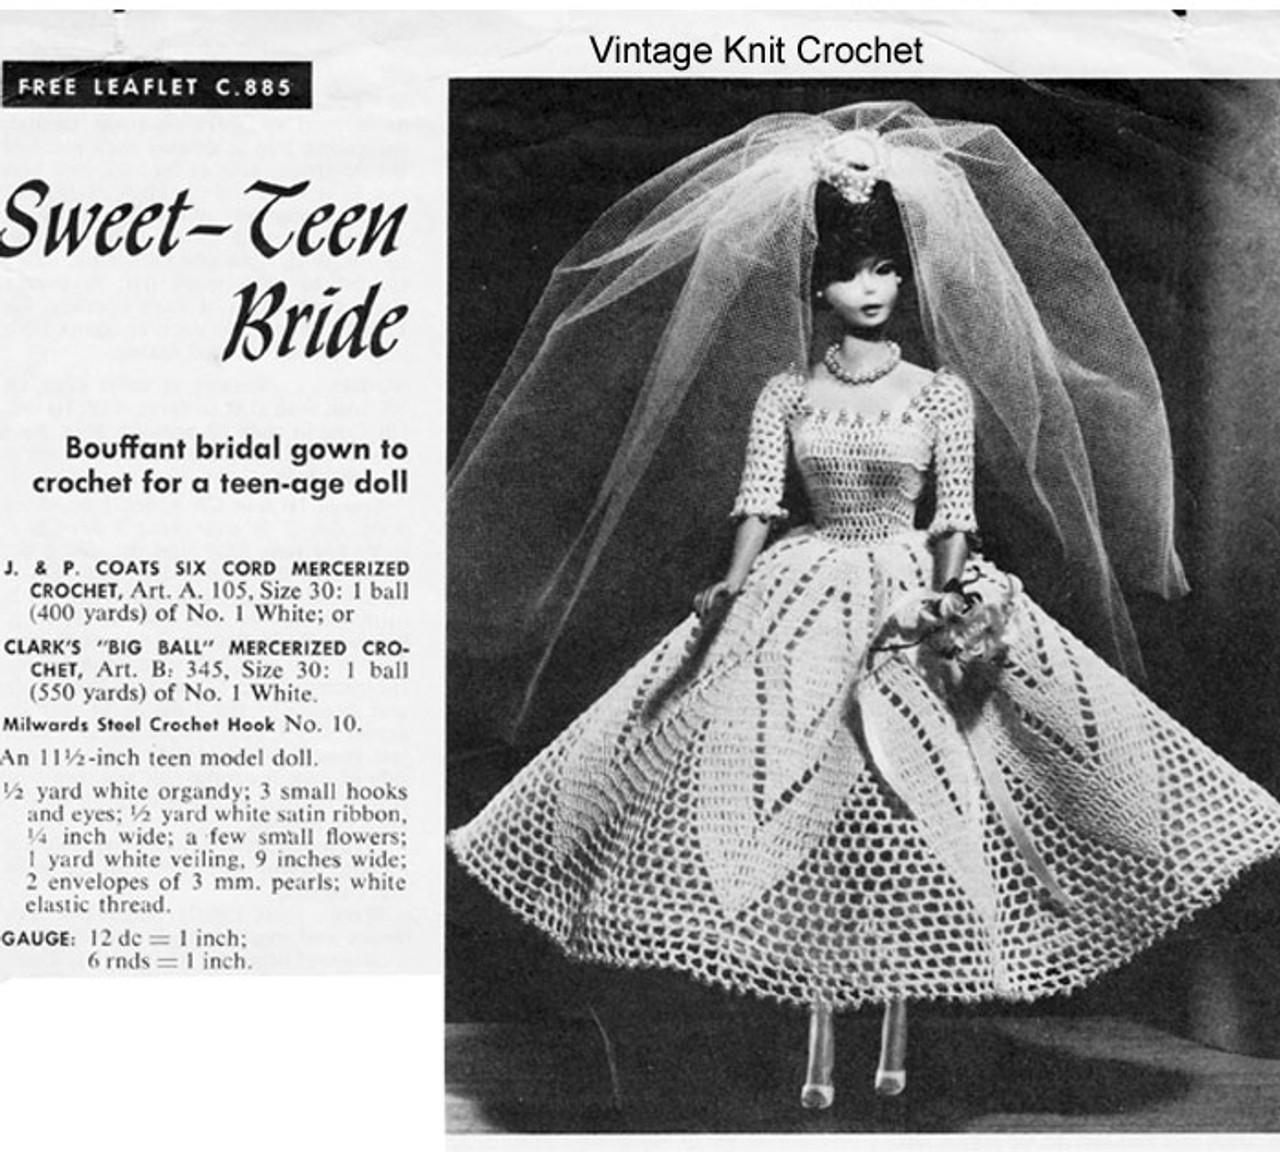 Crochet Fashion Doll Bride Dress Pattern Leaflet C-885